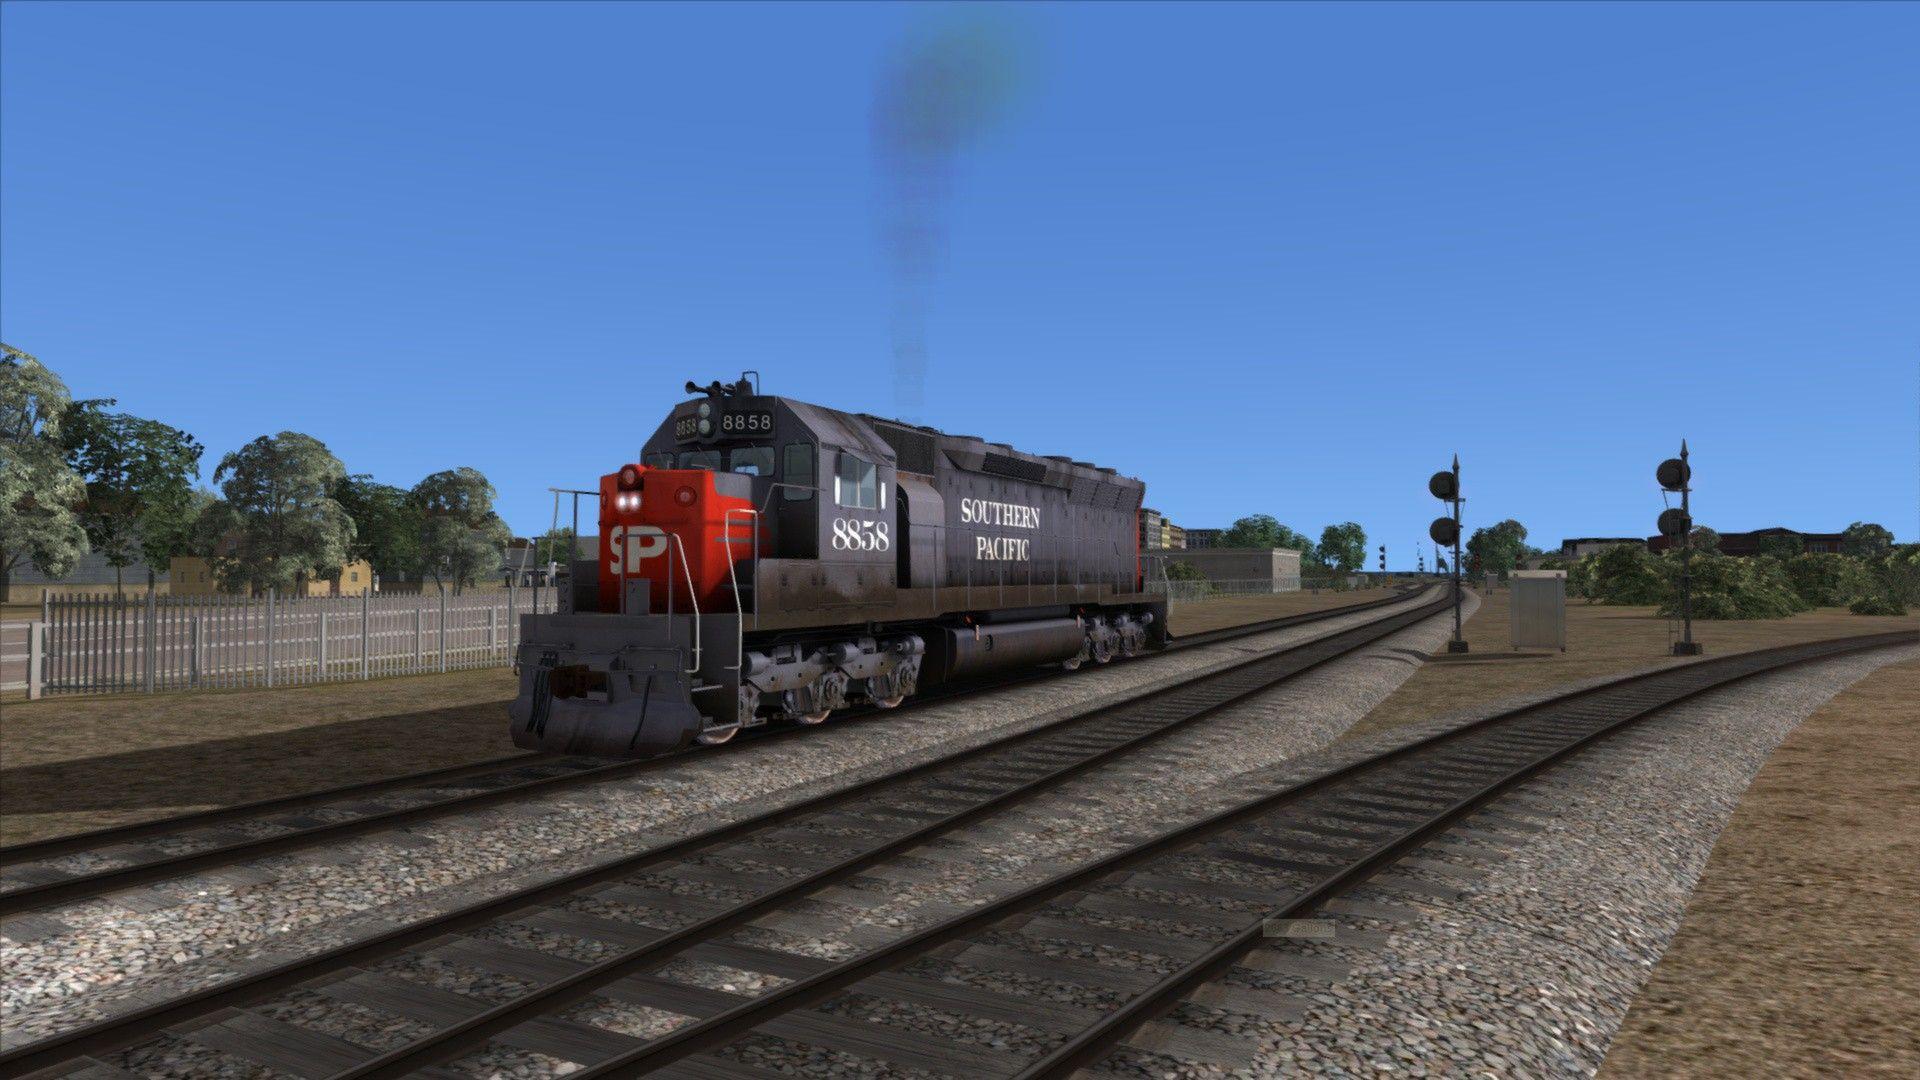 SPSD453